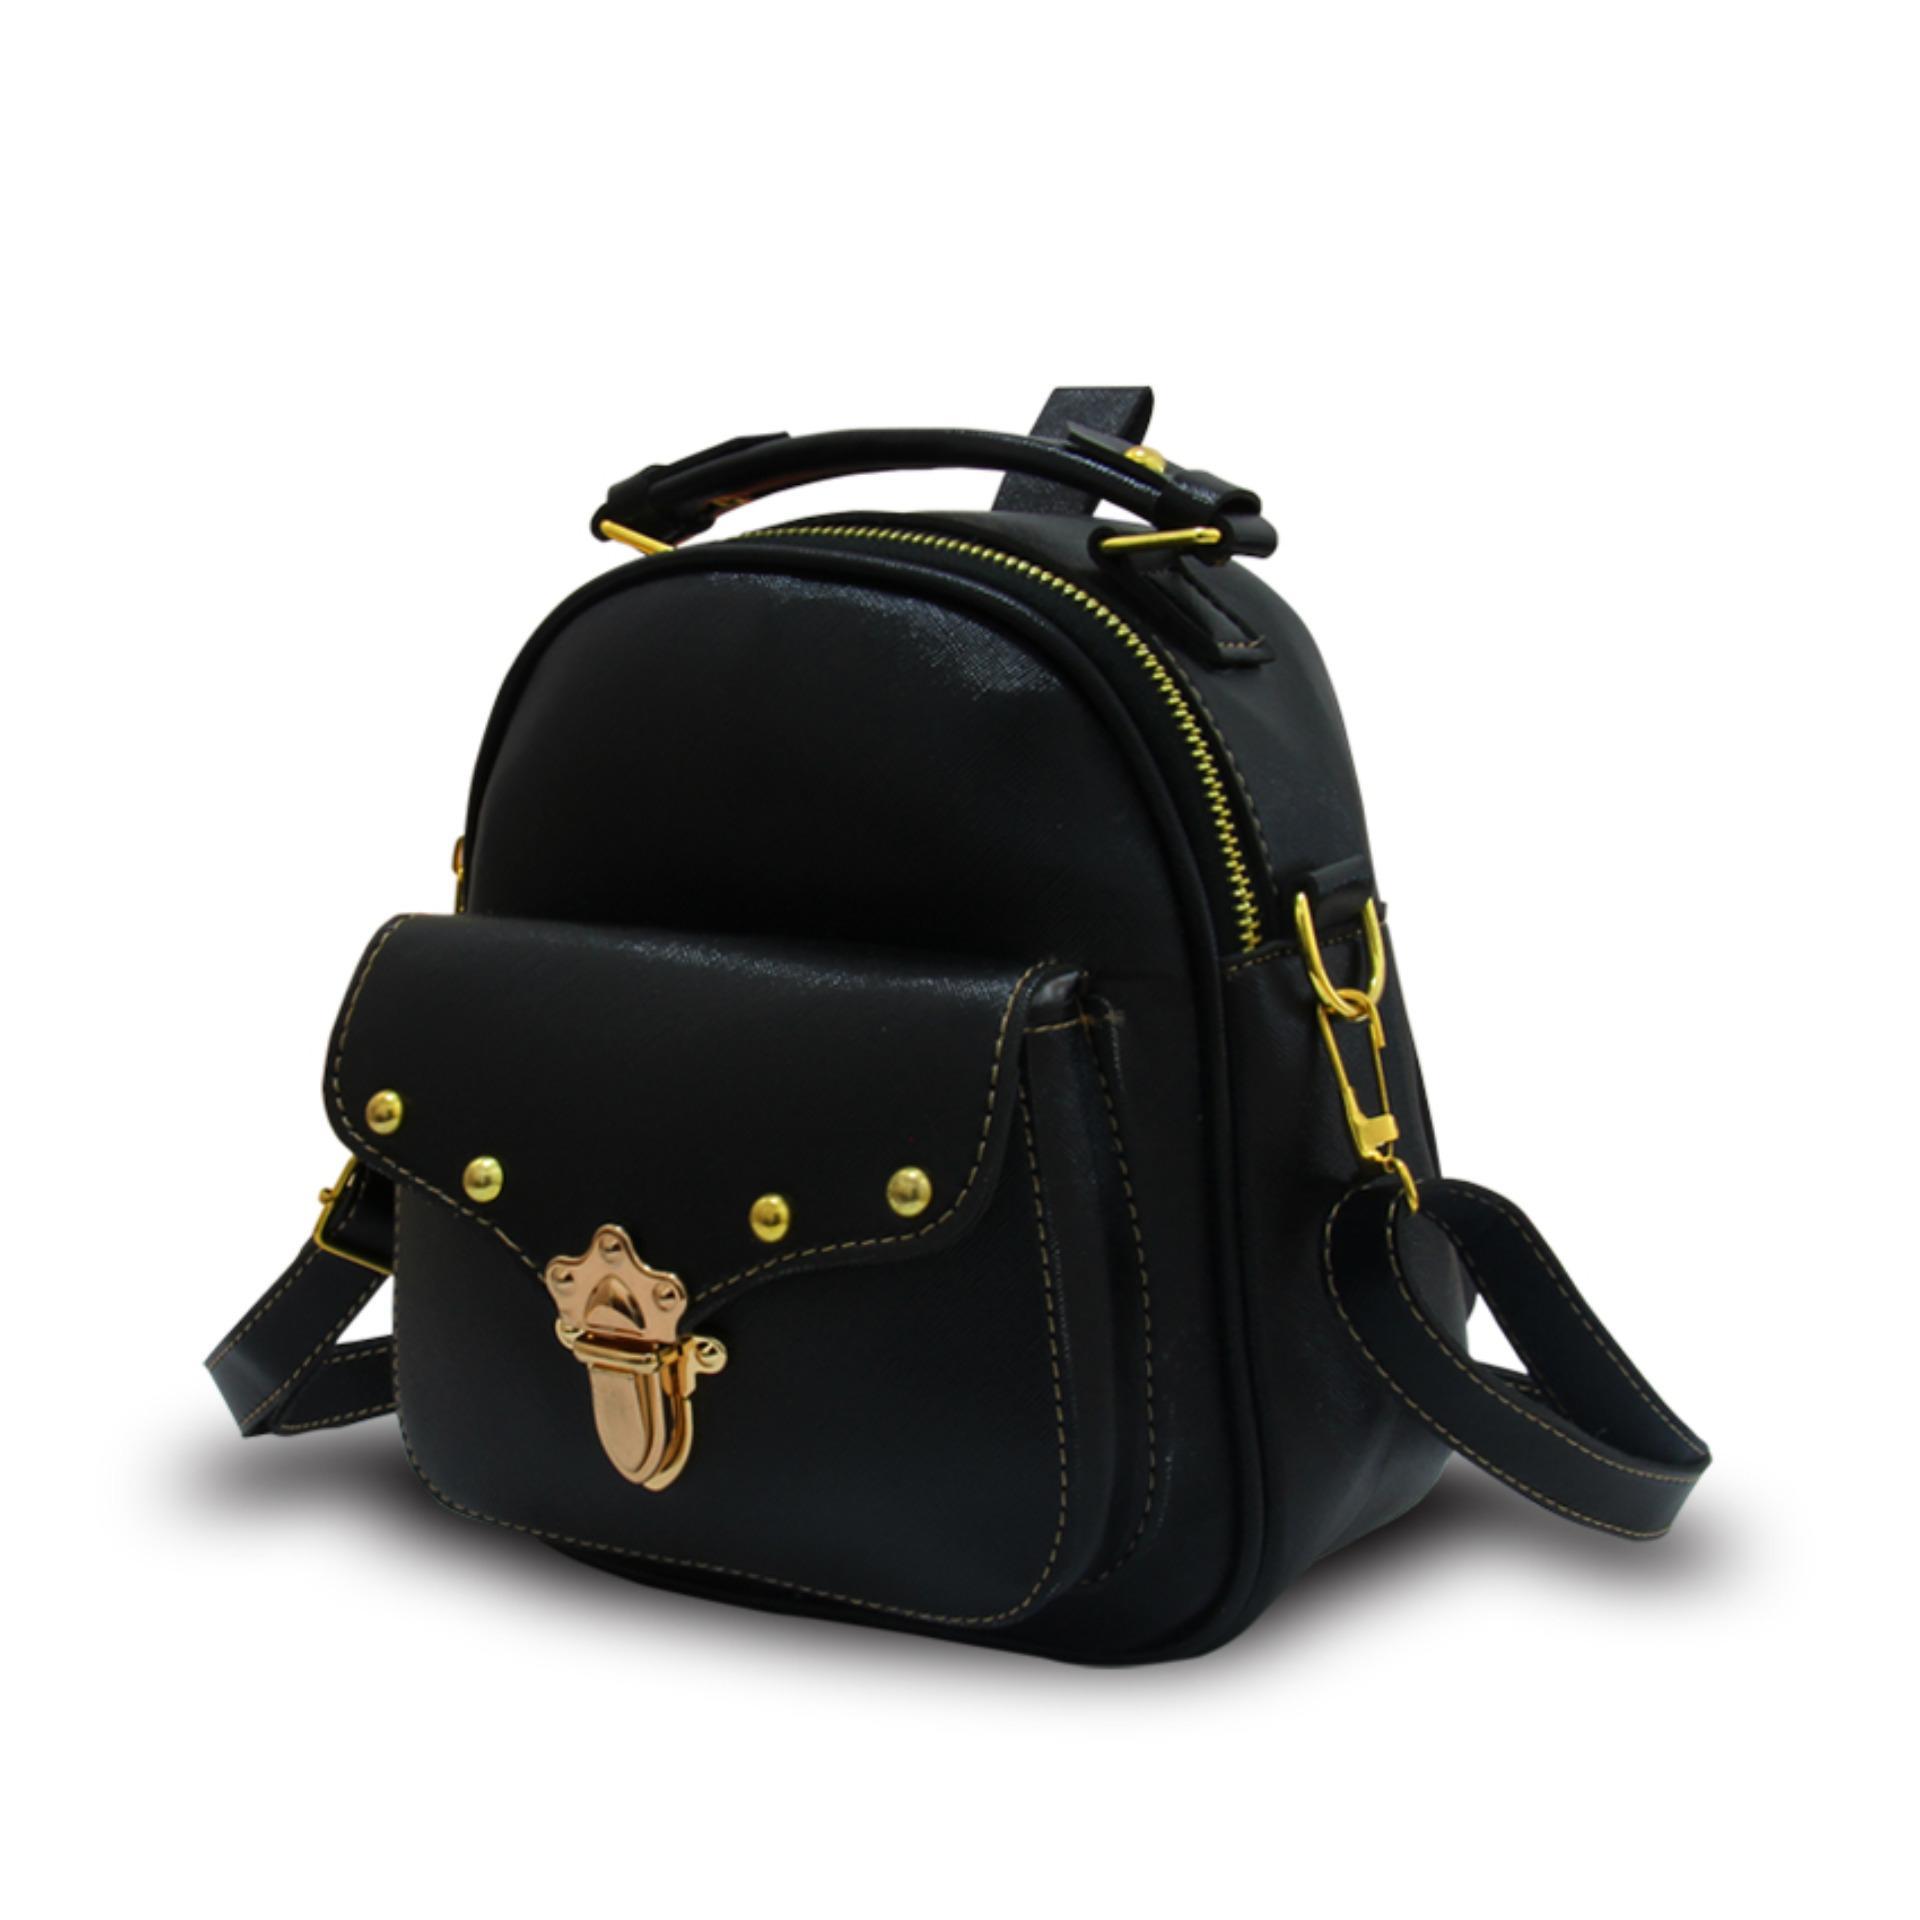 Fashionity Errika Mini backpack 0800 NAVY - Tas Wanita - 2 Fungsi - Tas Ransel -